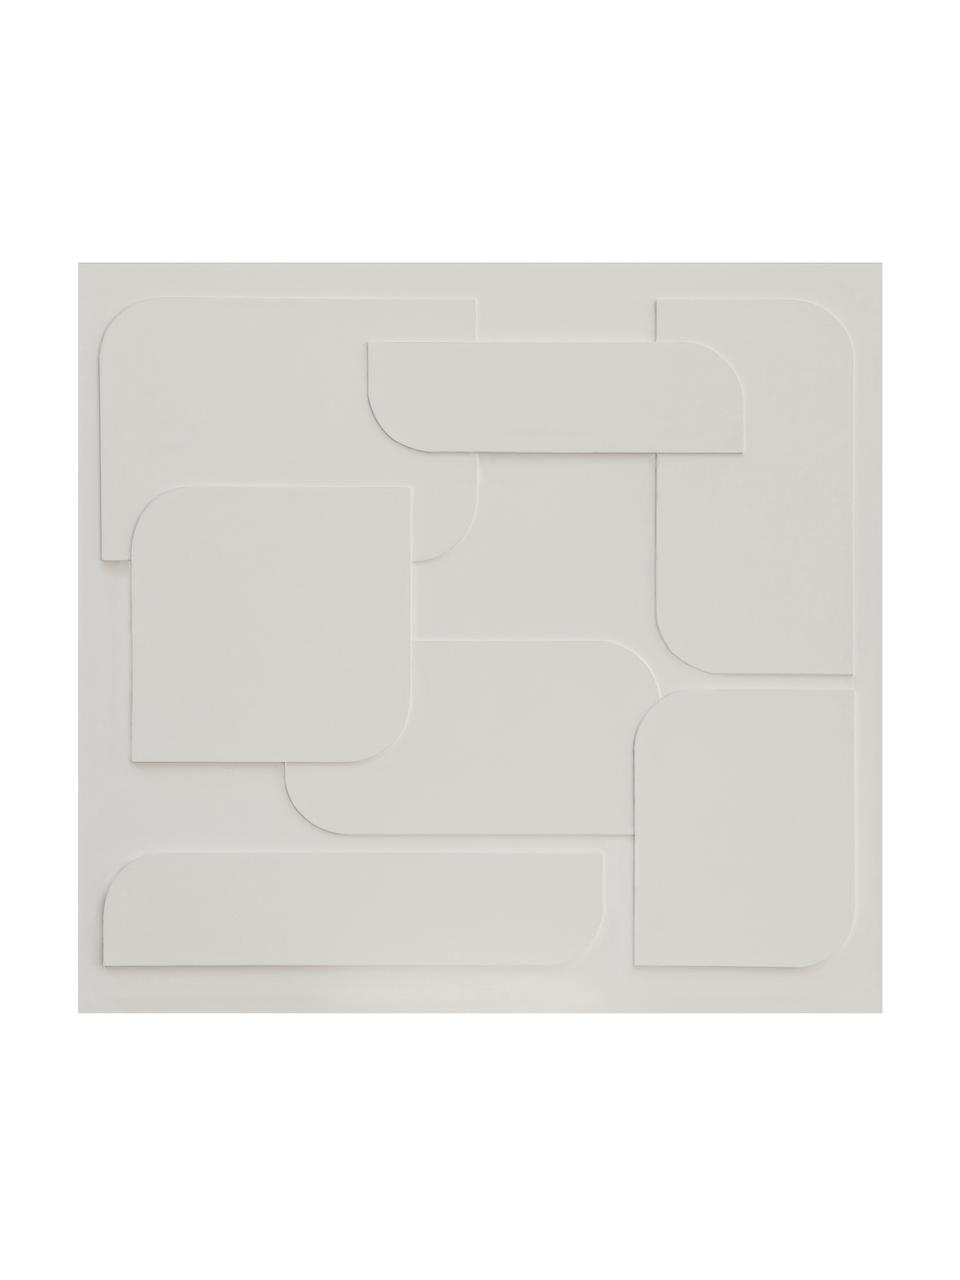 Adesivo murale 3D Geometric Art, Tessuto non tessuto, Beige, Larg. 300 x Alt. 280 cm